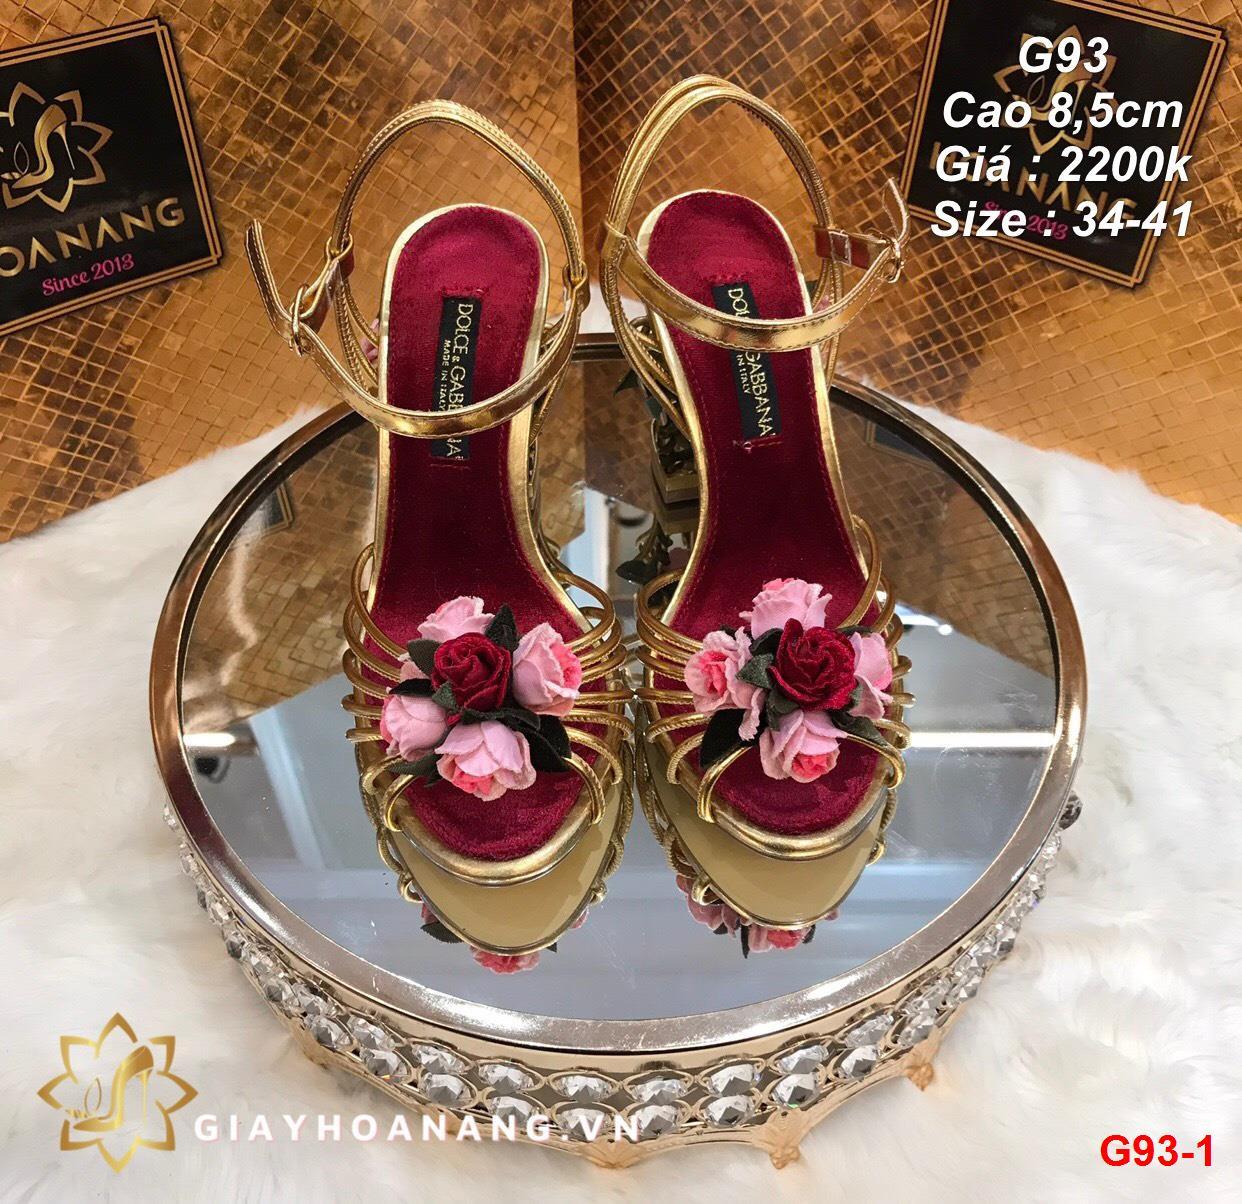 G93-1 Dolce & Gabbana sandal cao 8,5cm siêu cấp